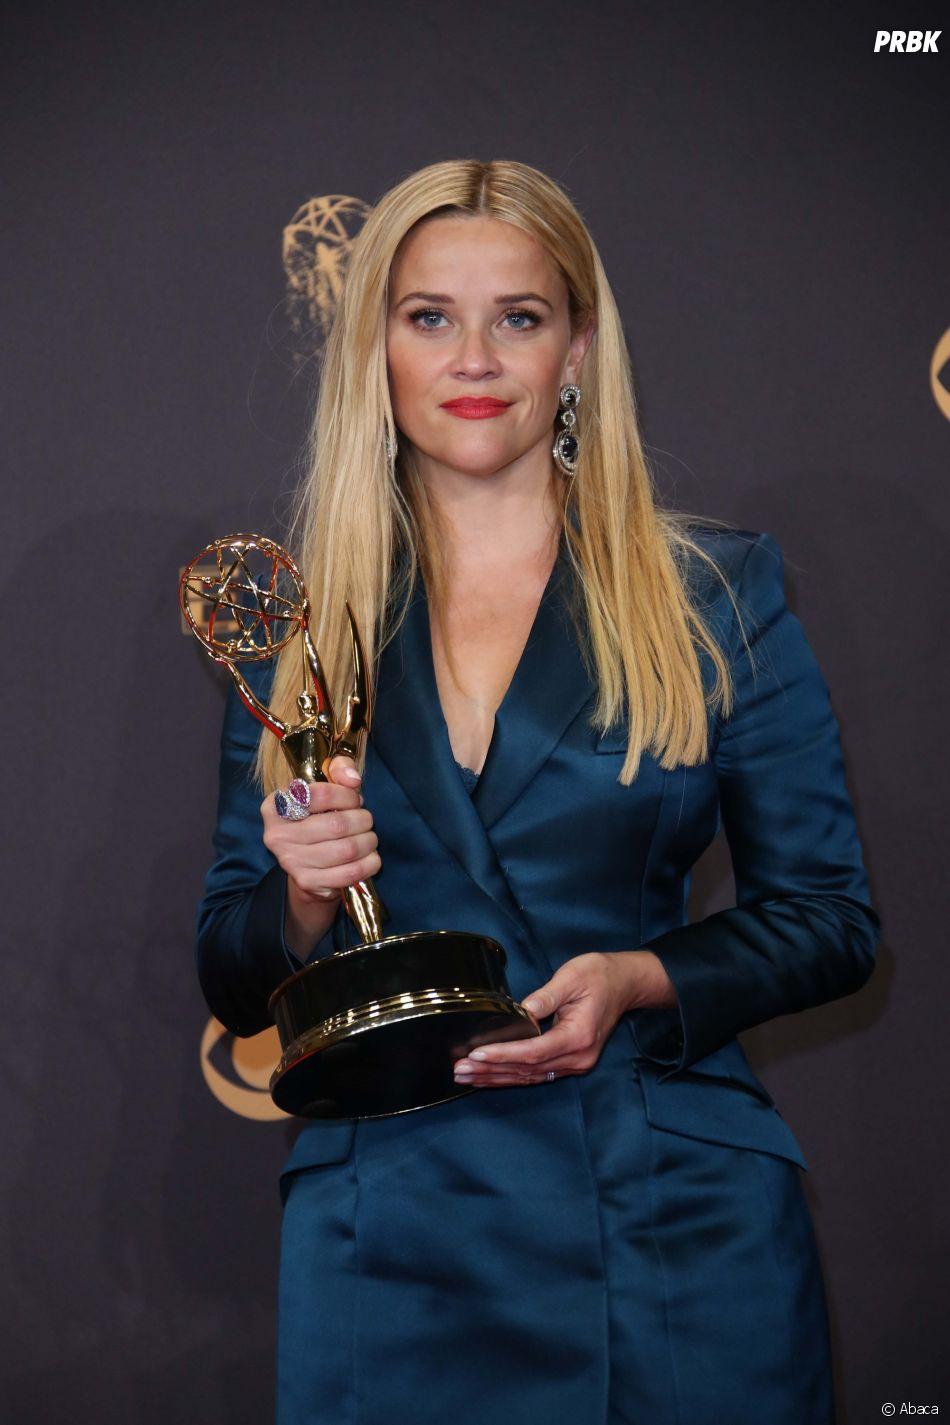 Emmy Awards 2017 : Big Little Lies rafle plusieurs prix.